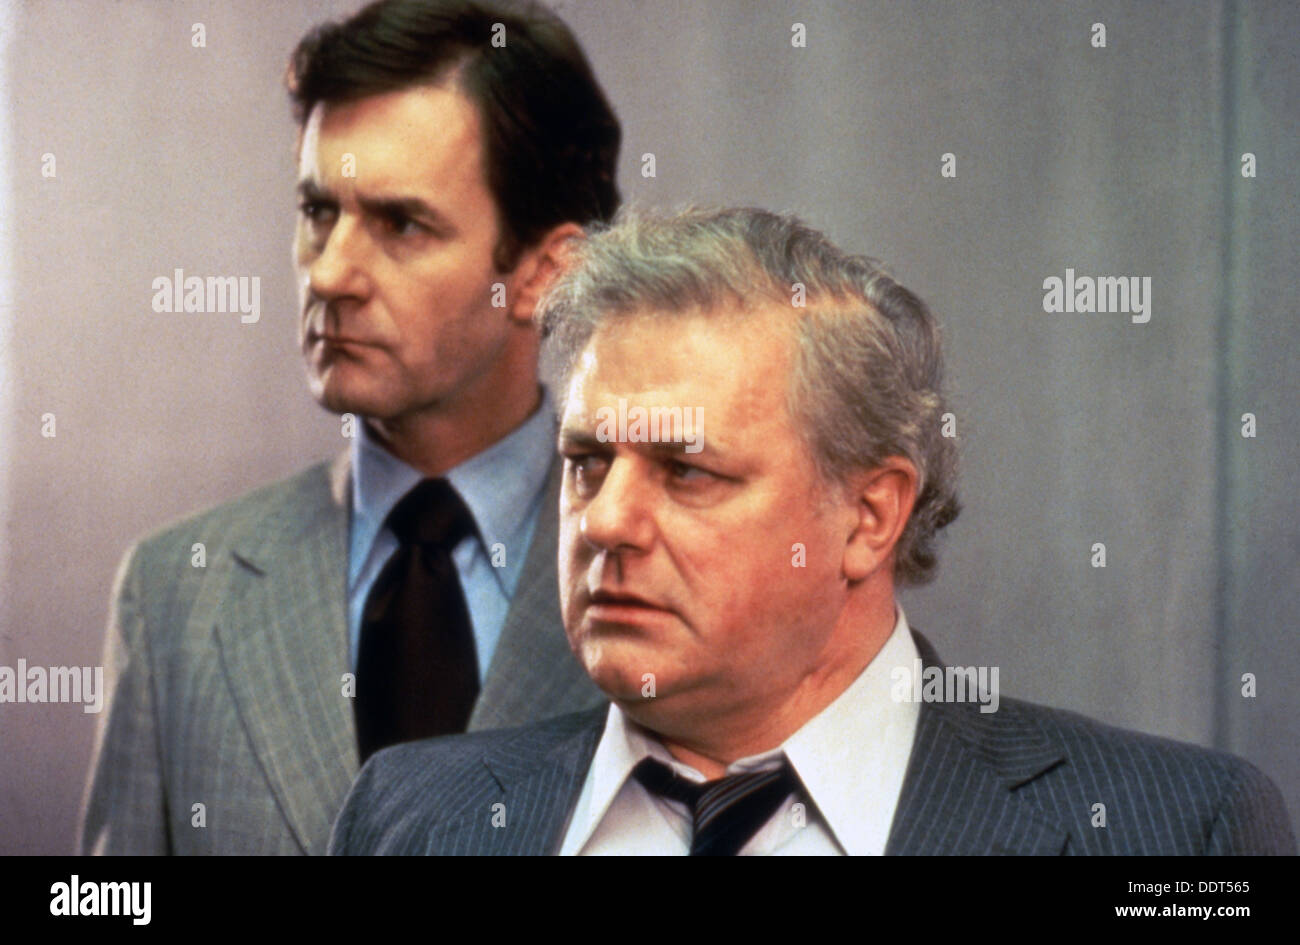 ATTICA (1980) (TVM) CHARLES DURNING, MARVIN J CHOMSKY (DIR) ATC 006 MOVIESTORE COLLECTION LTD - Stock Image